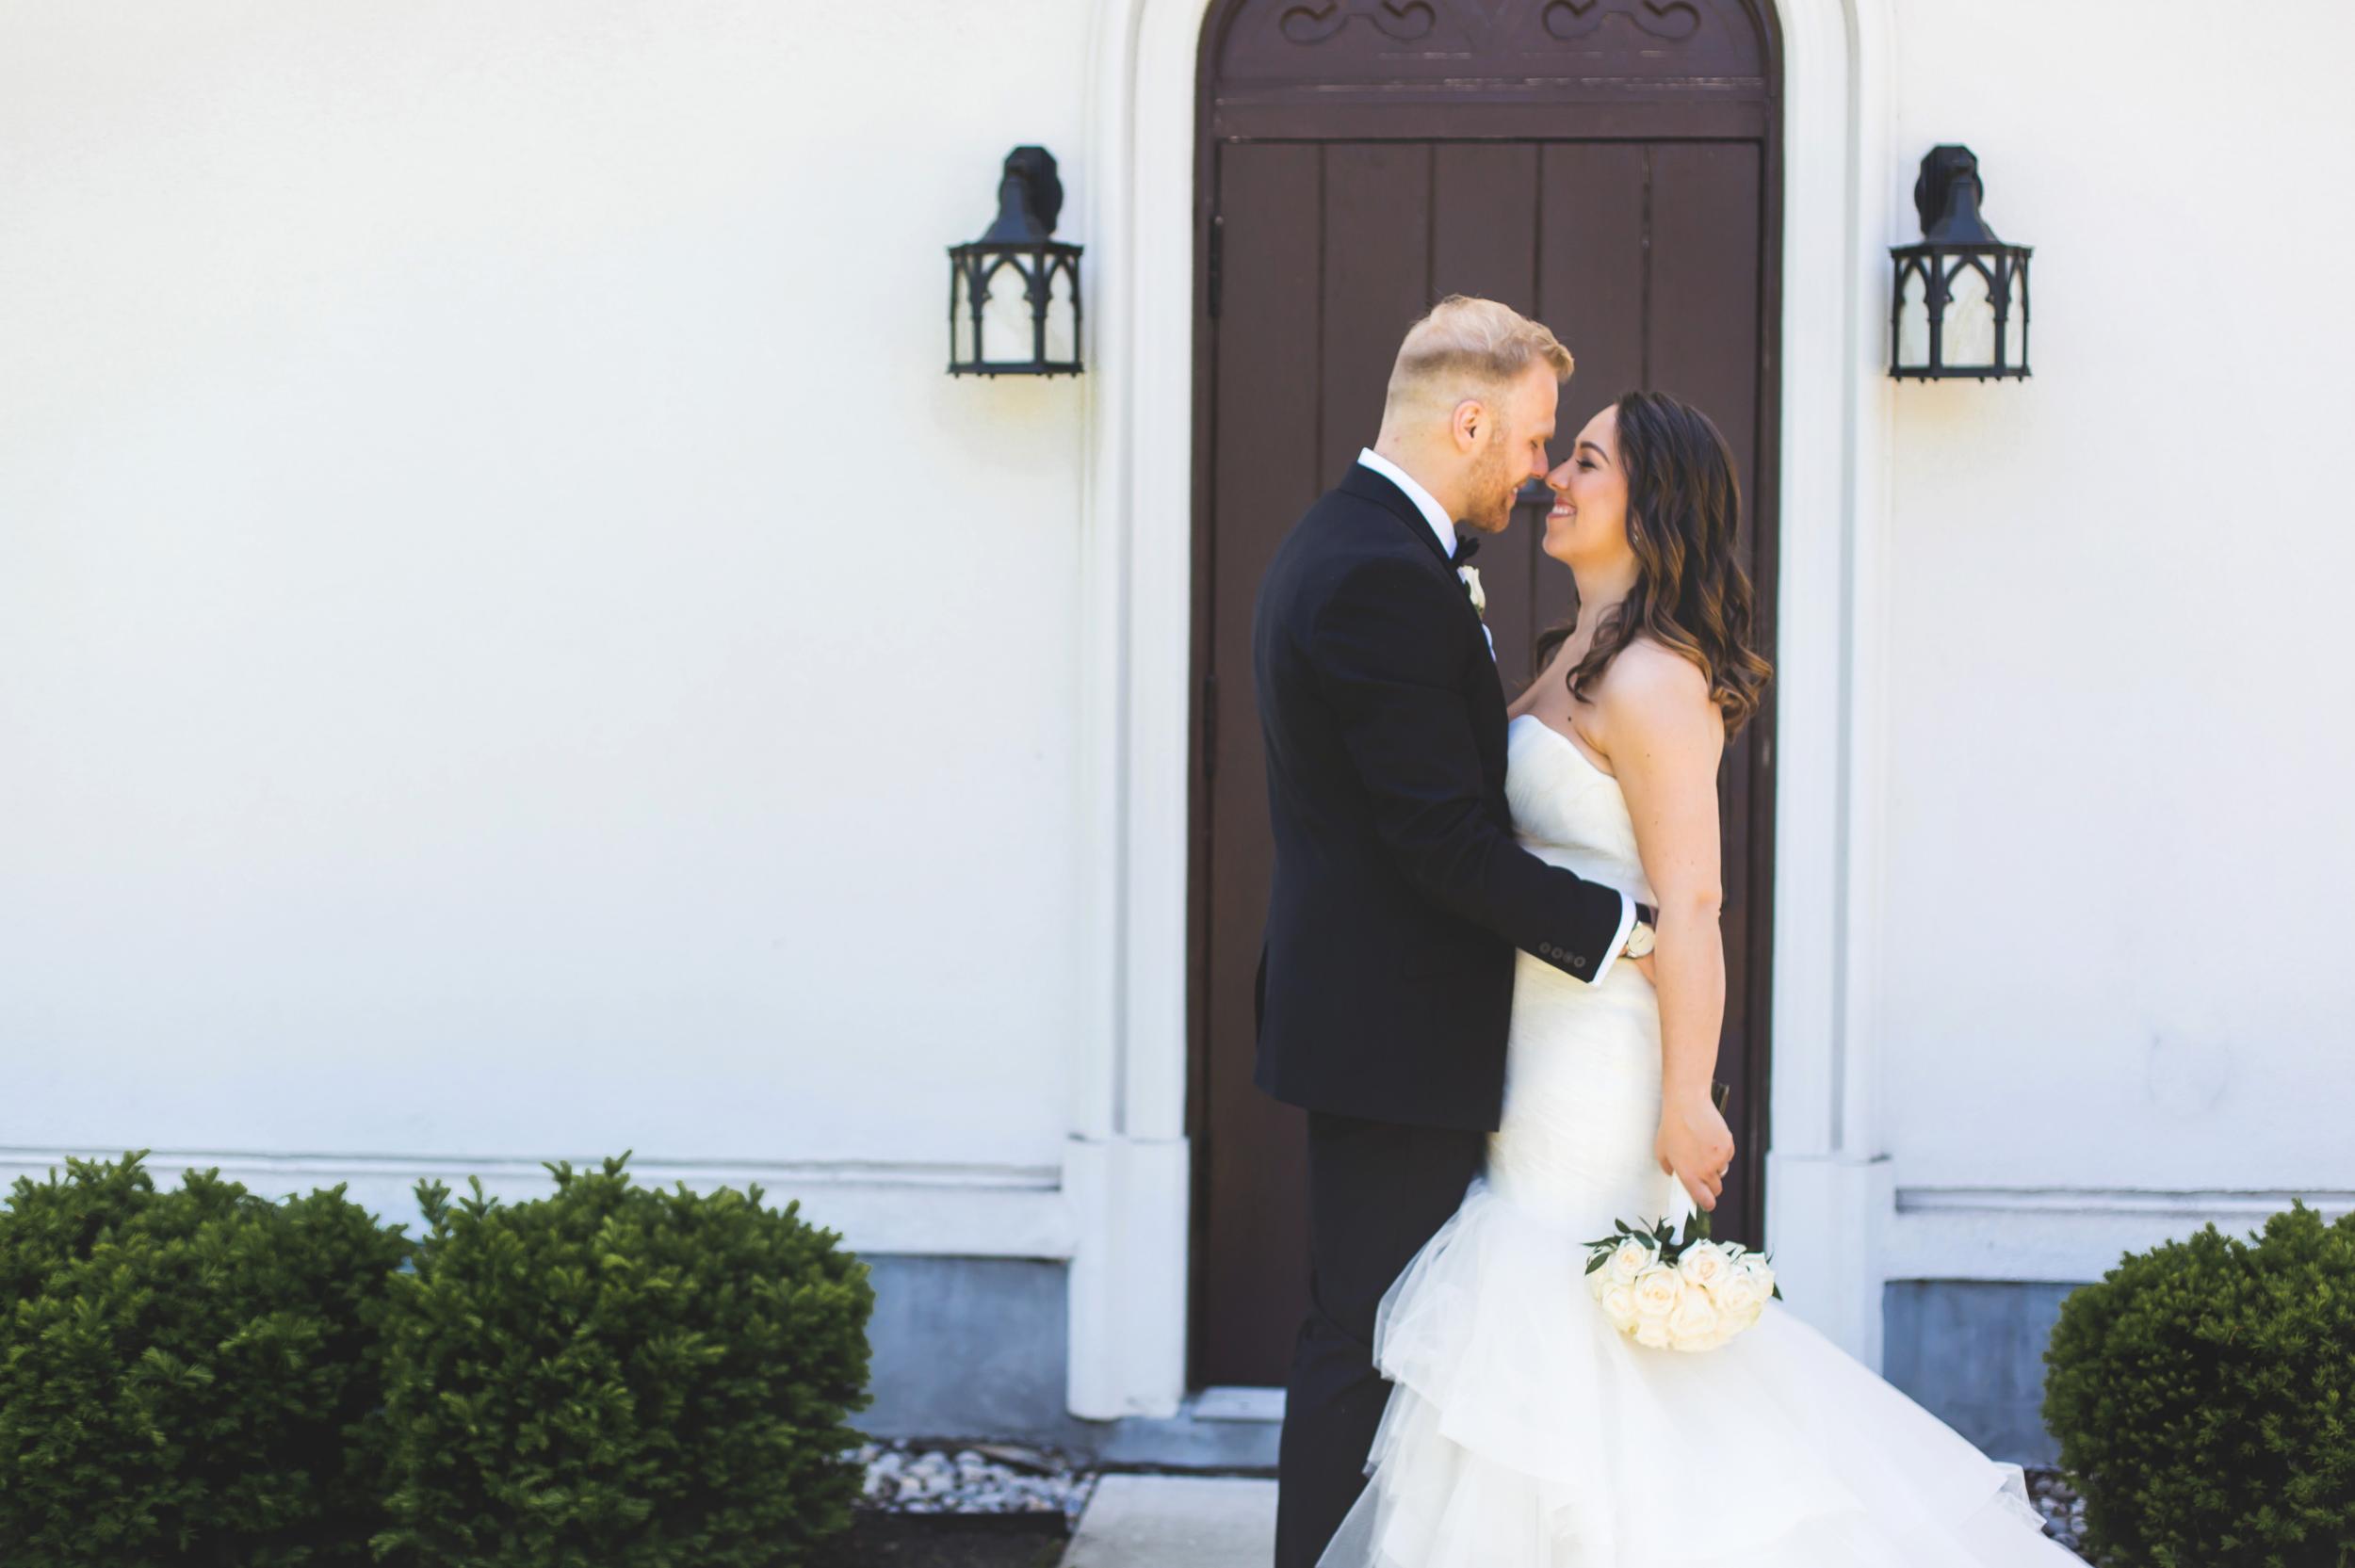 Wedding-Harbour-Banquet-Center-Oakville-Photographer-Wedding-Hamilton-Saint-James-Espresso-Downtown-HamOnt-GTA-Niagara-Toronto-Moments-by-Lauren-Photography-Photo-Image-23.png